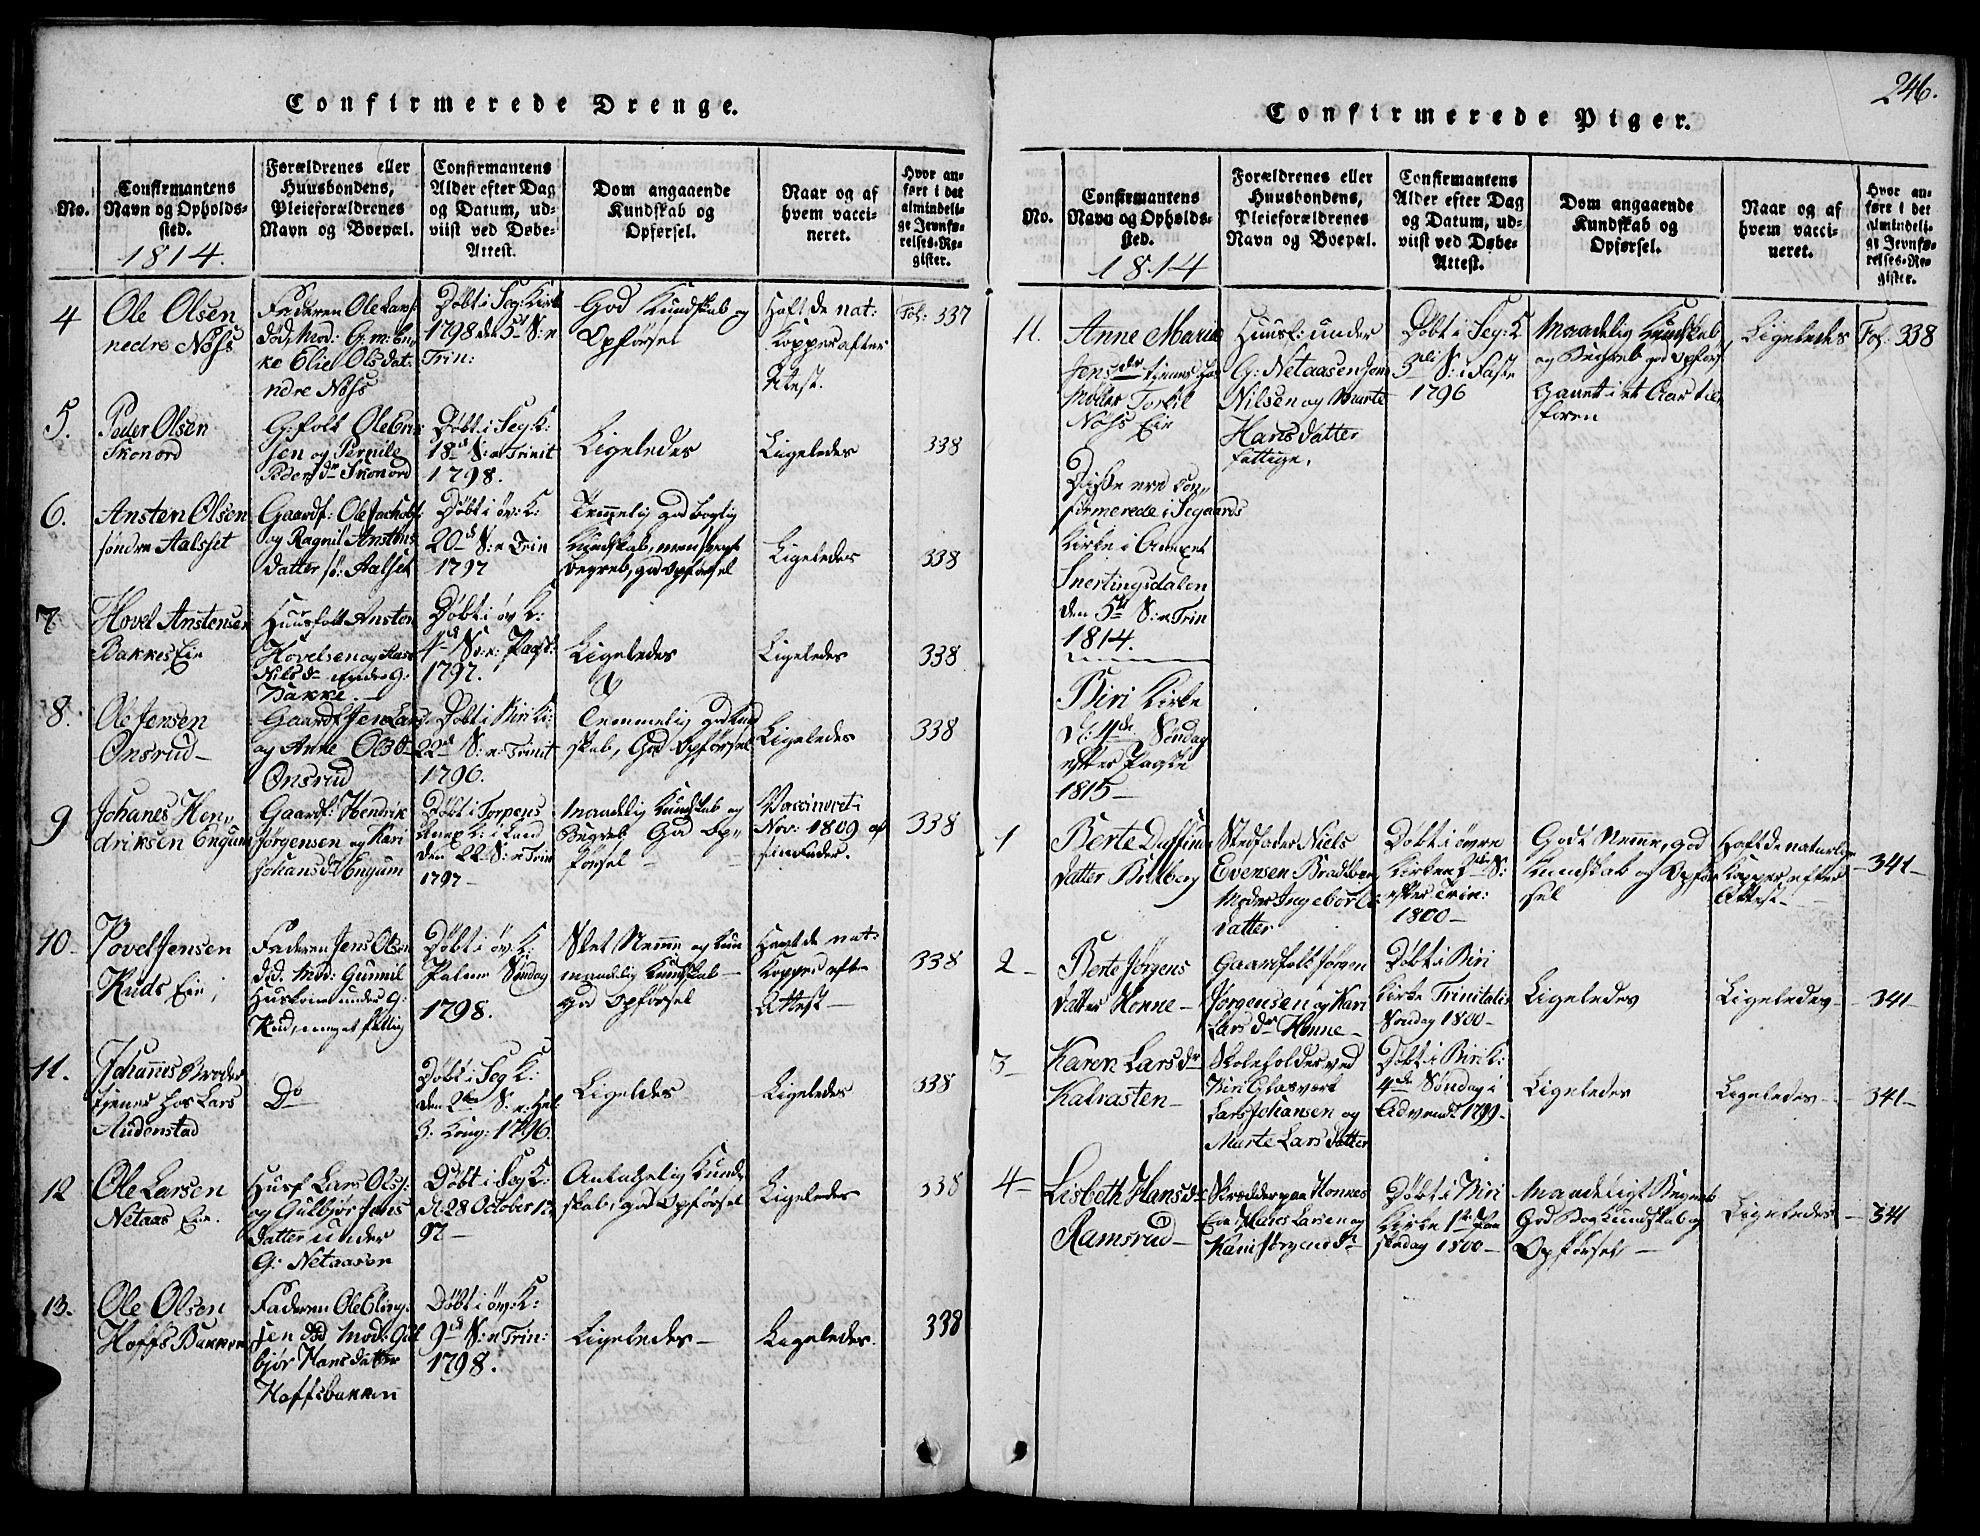 SAH, Biri prestekontor, Klokkerbok nr. 1, 1814-1828, s. 246